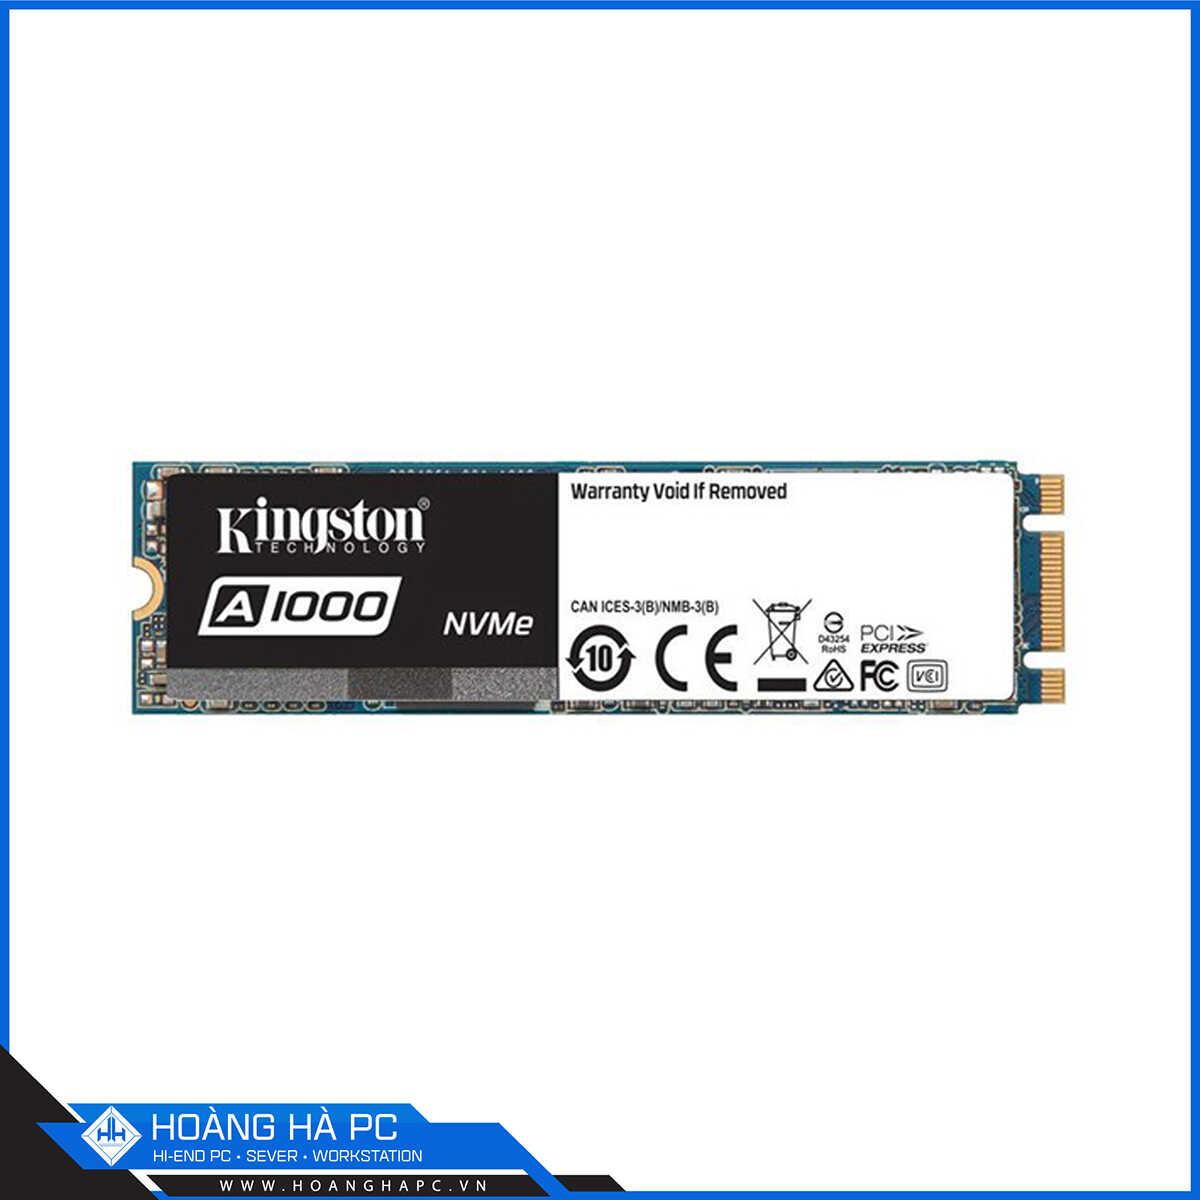 ổ cứng SSD Kingston A1000 480GB